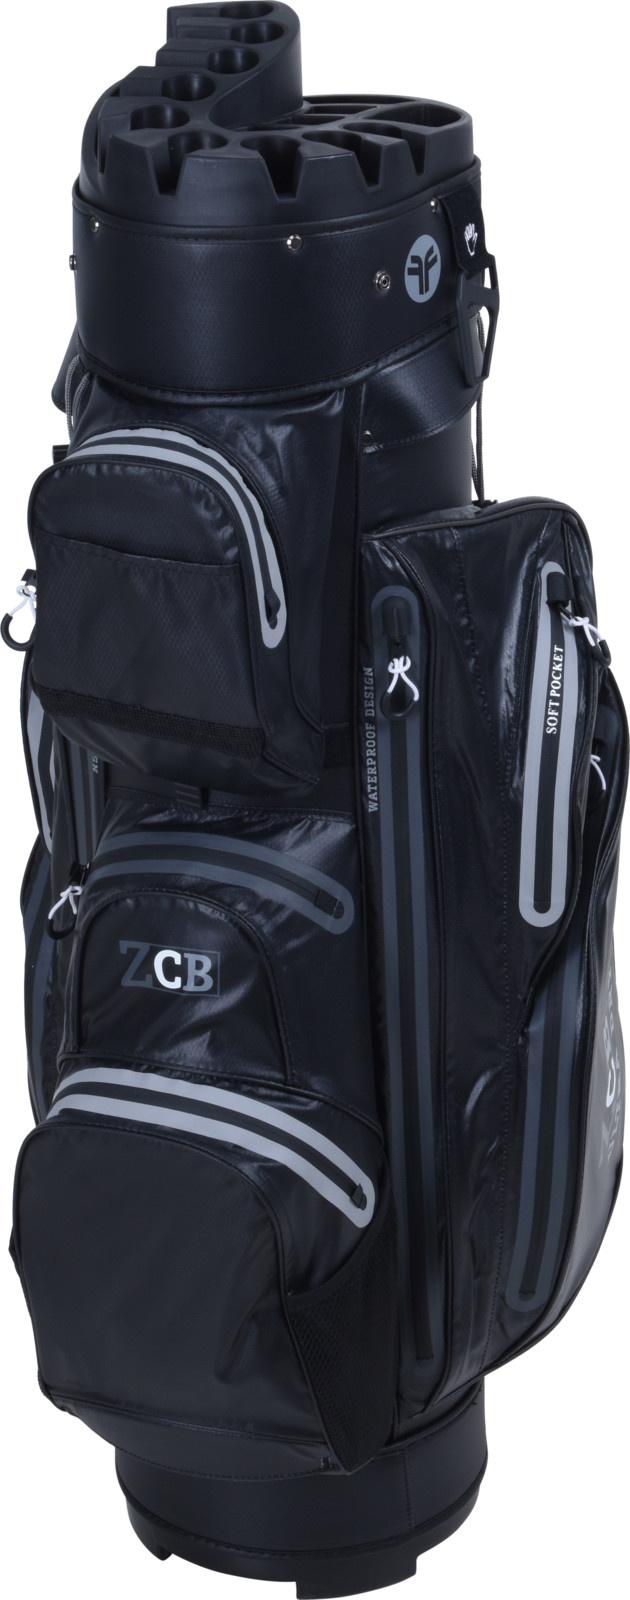 FastFold Fastfold ZCB Waterproof Cart Bag Black/Grey